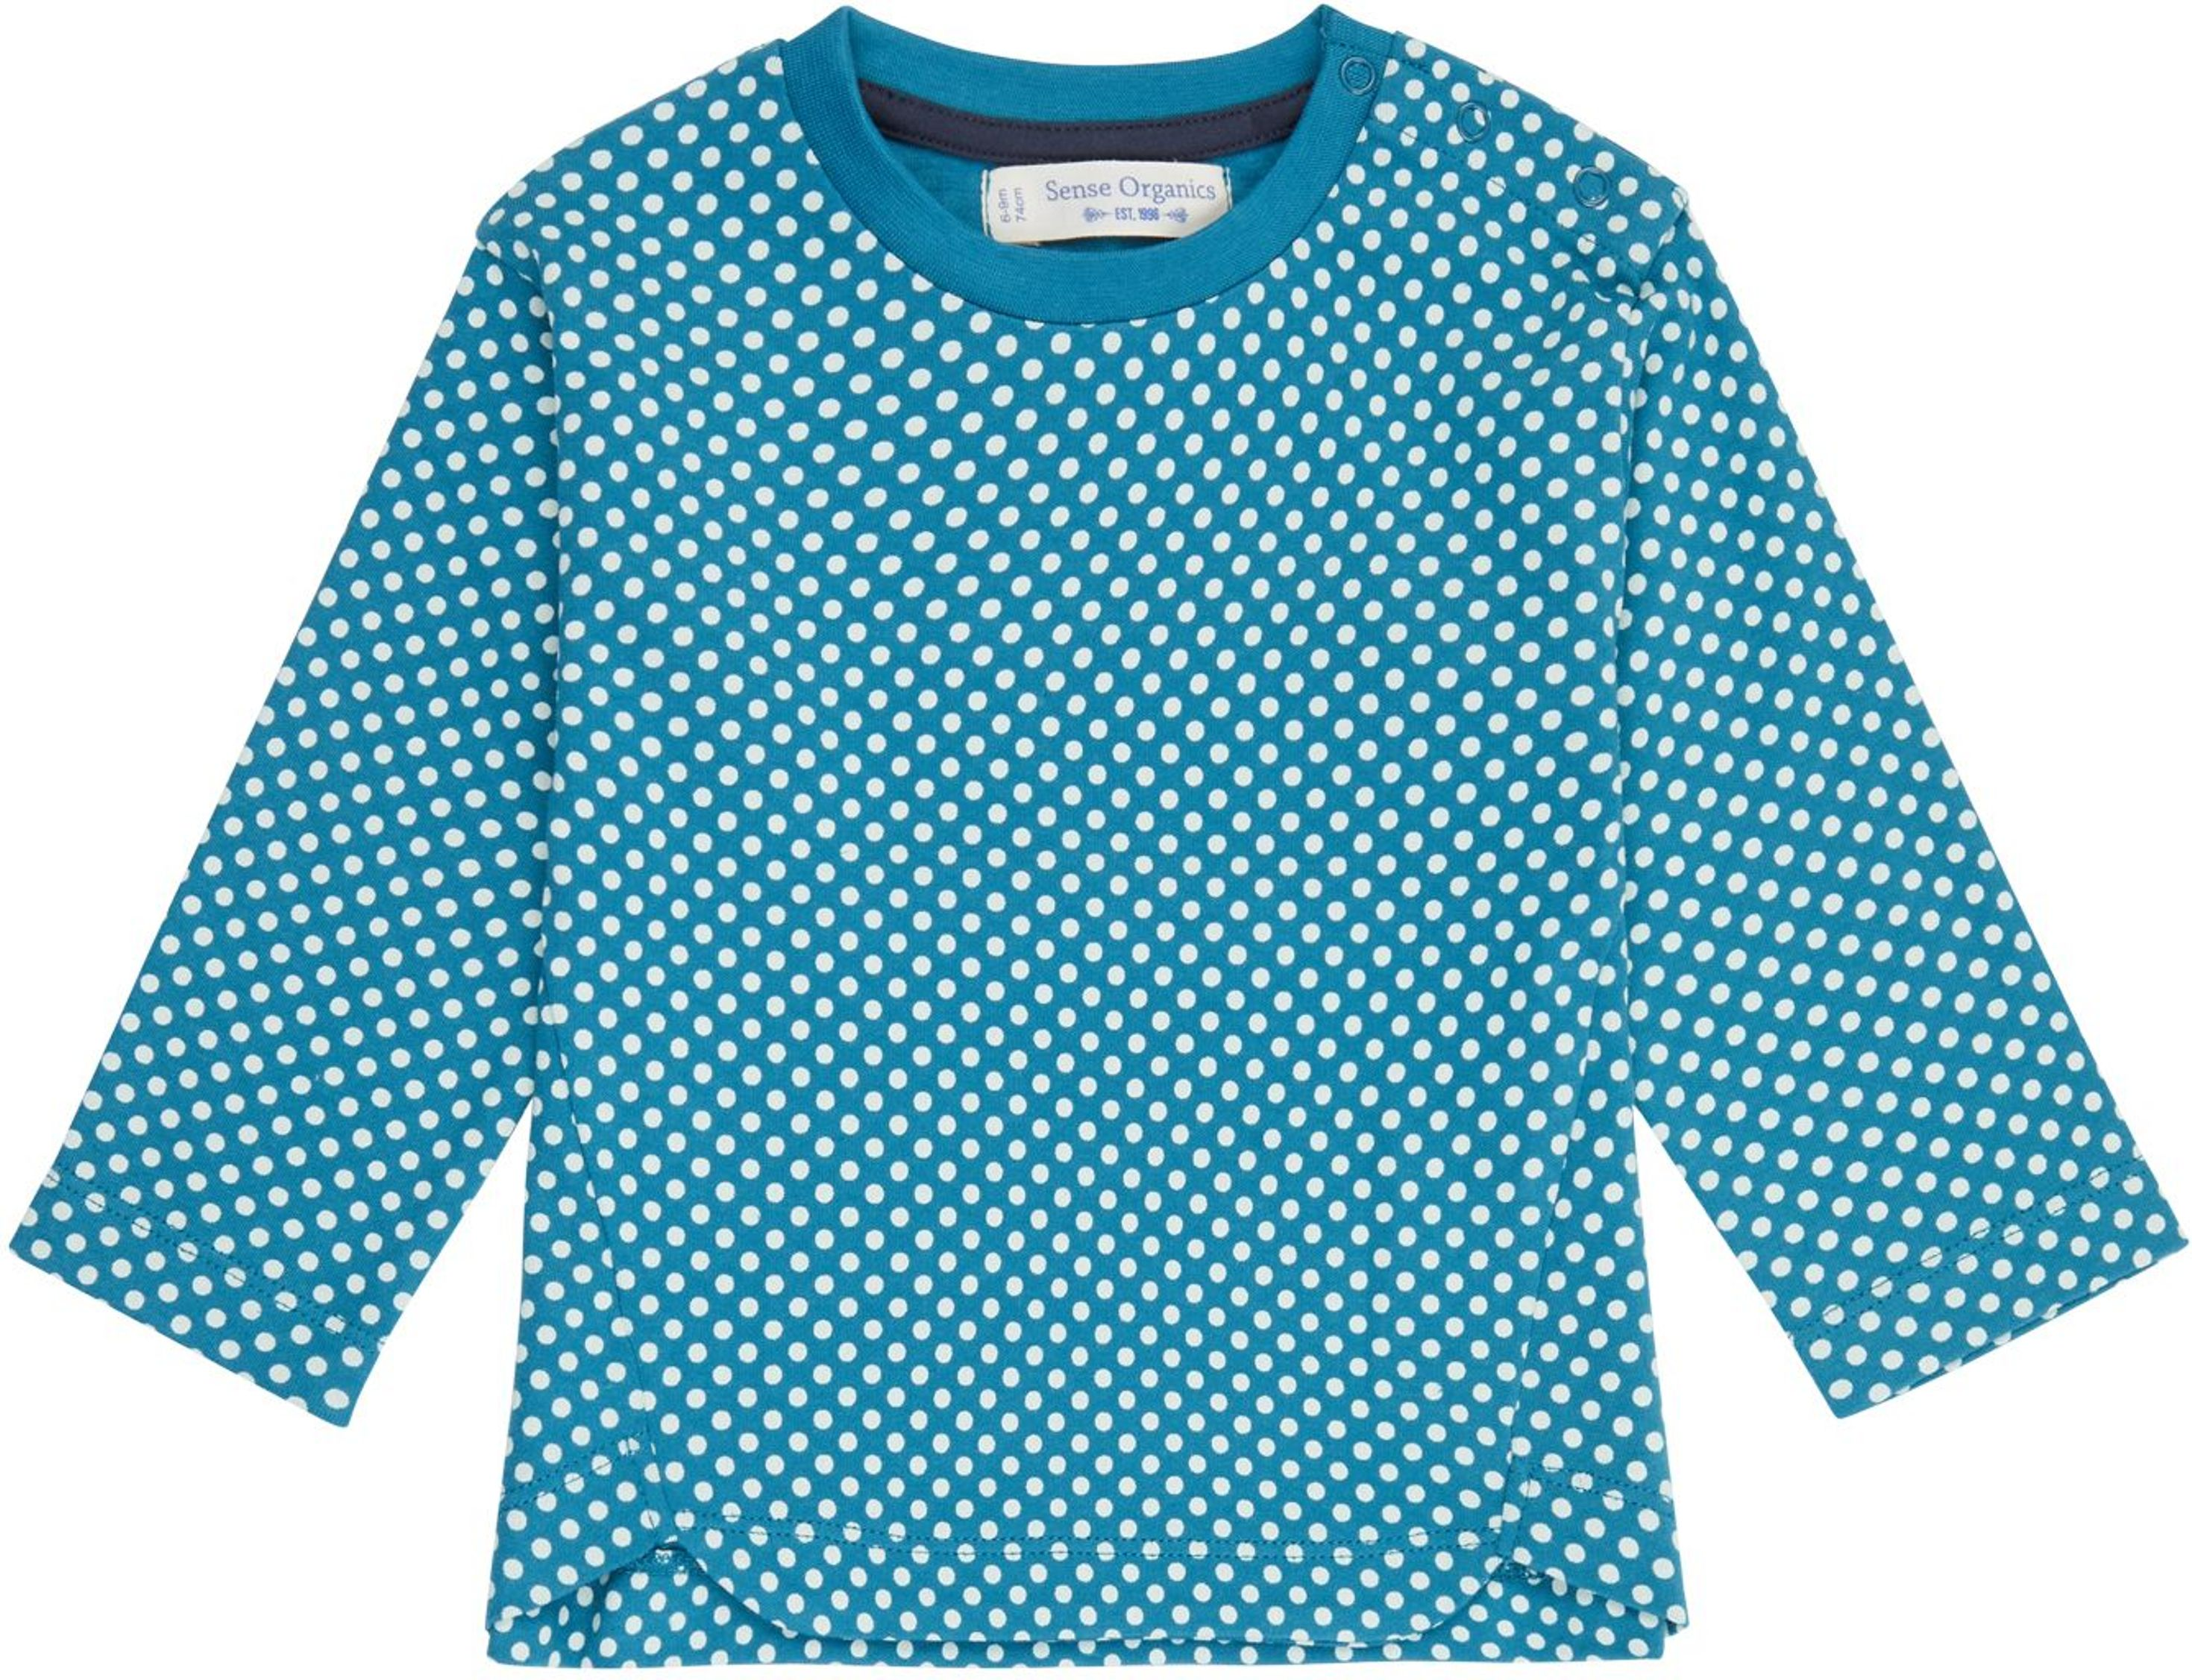 Sense Organic KLARA Baby Shirt L/S AOP Polka Dots